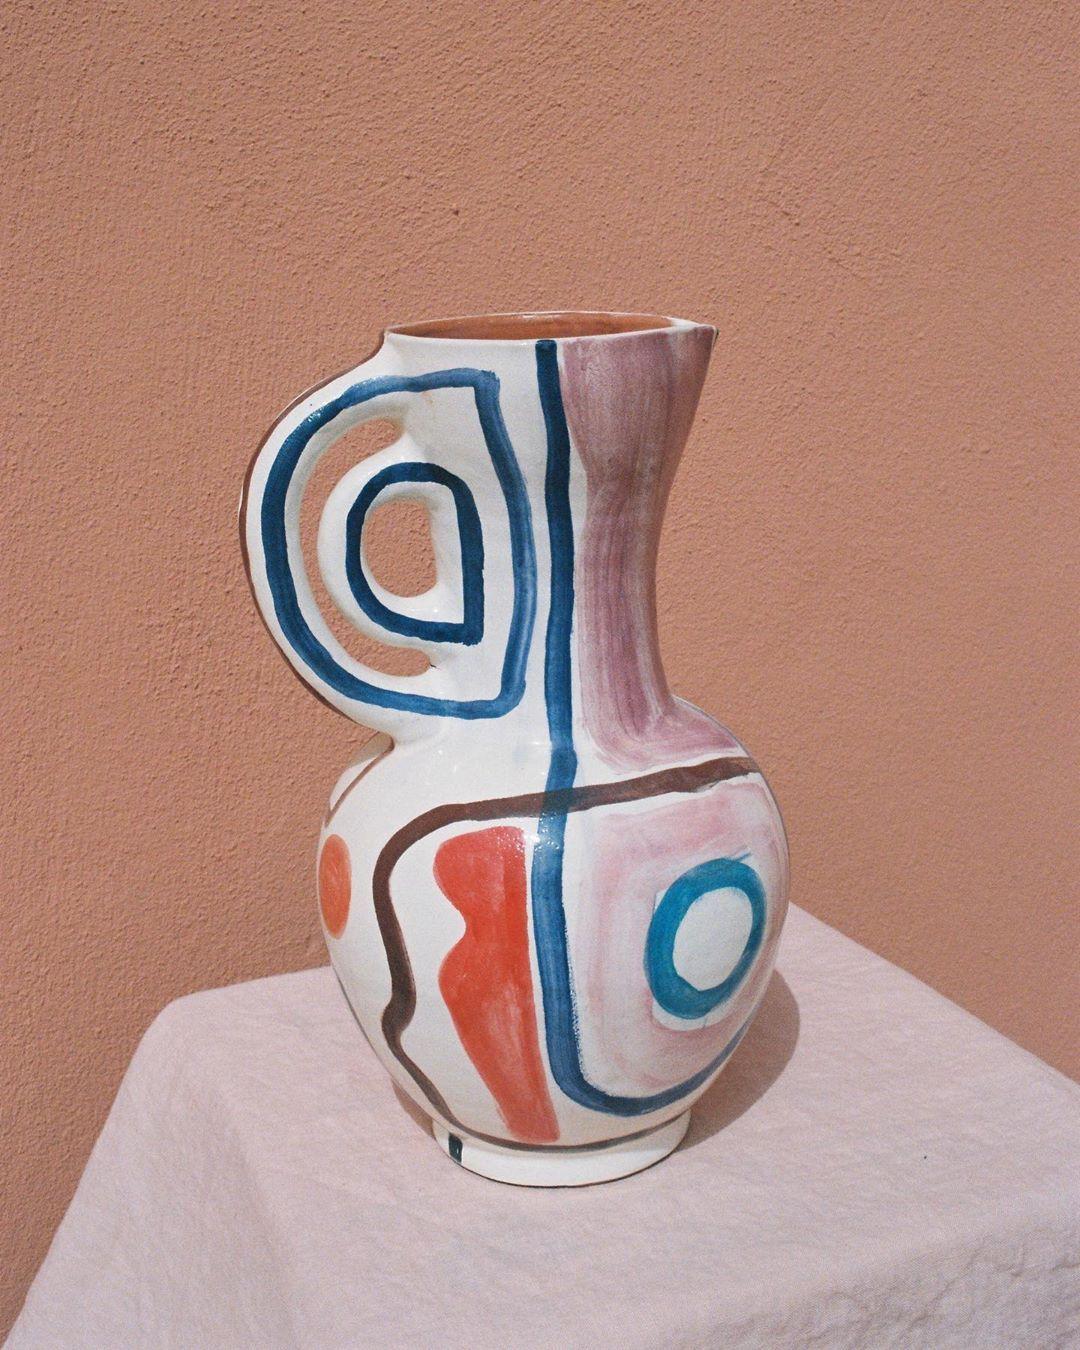 Lrnce On Instagram Azrou Vase Lrnce Ceramics Vase Marrakech Morocco En 2020